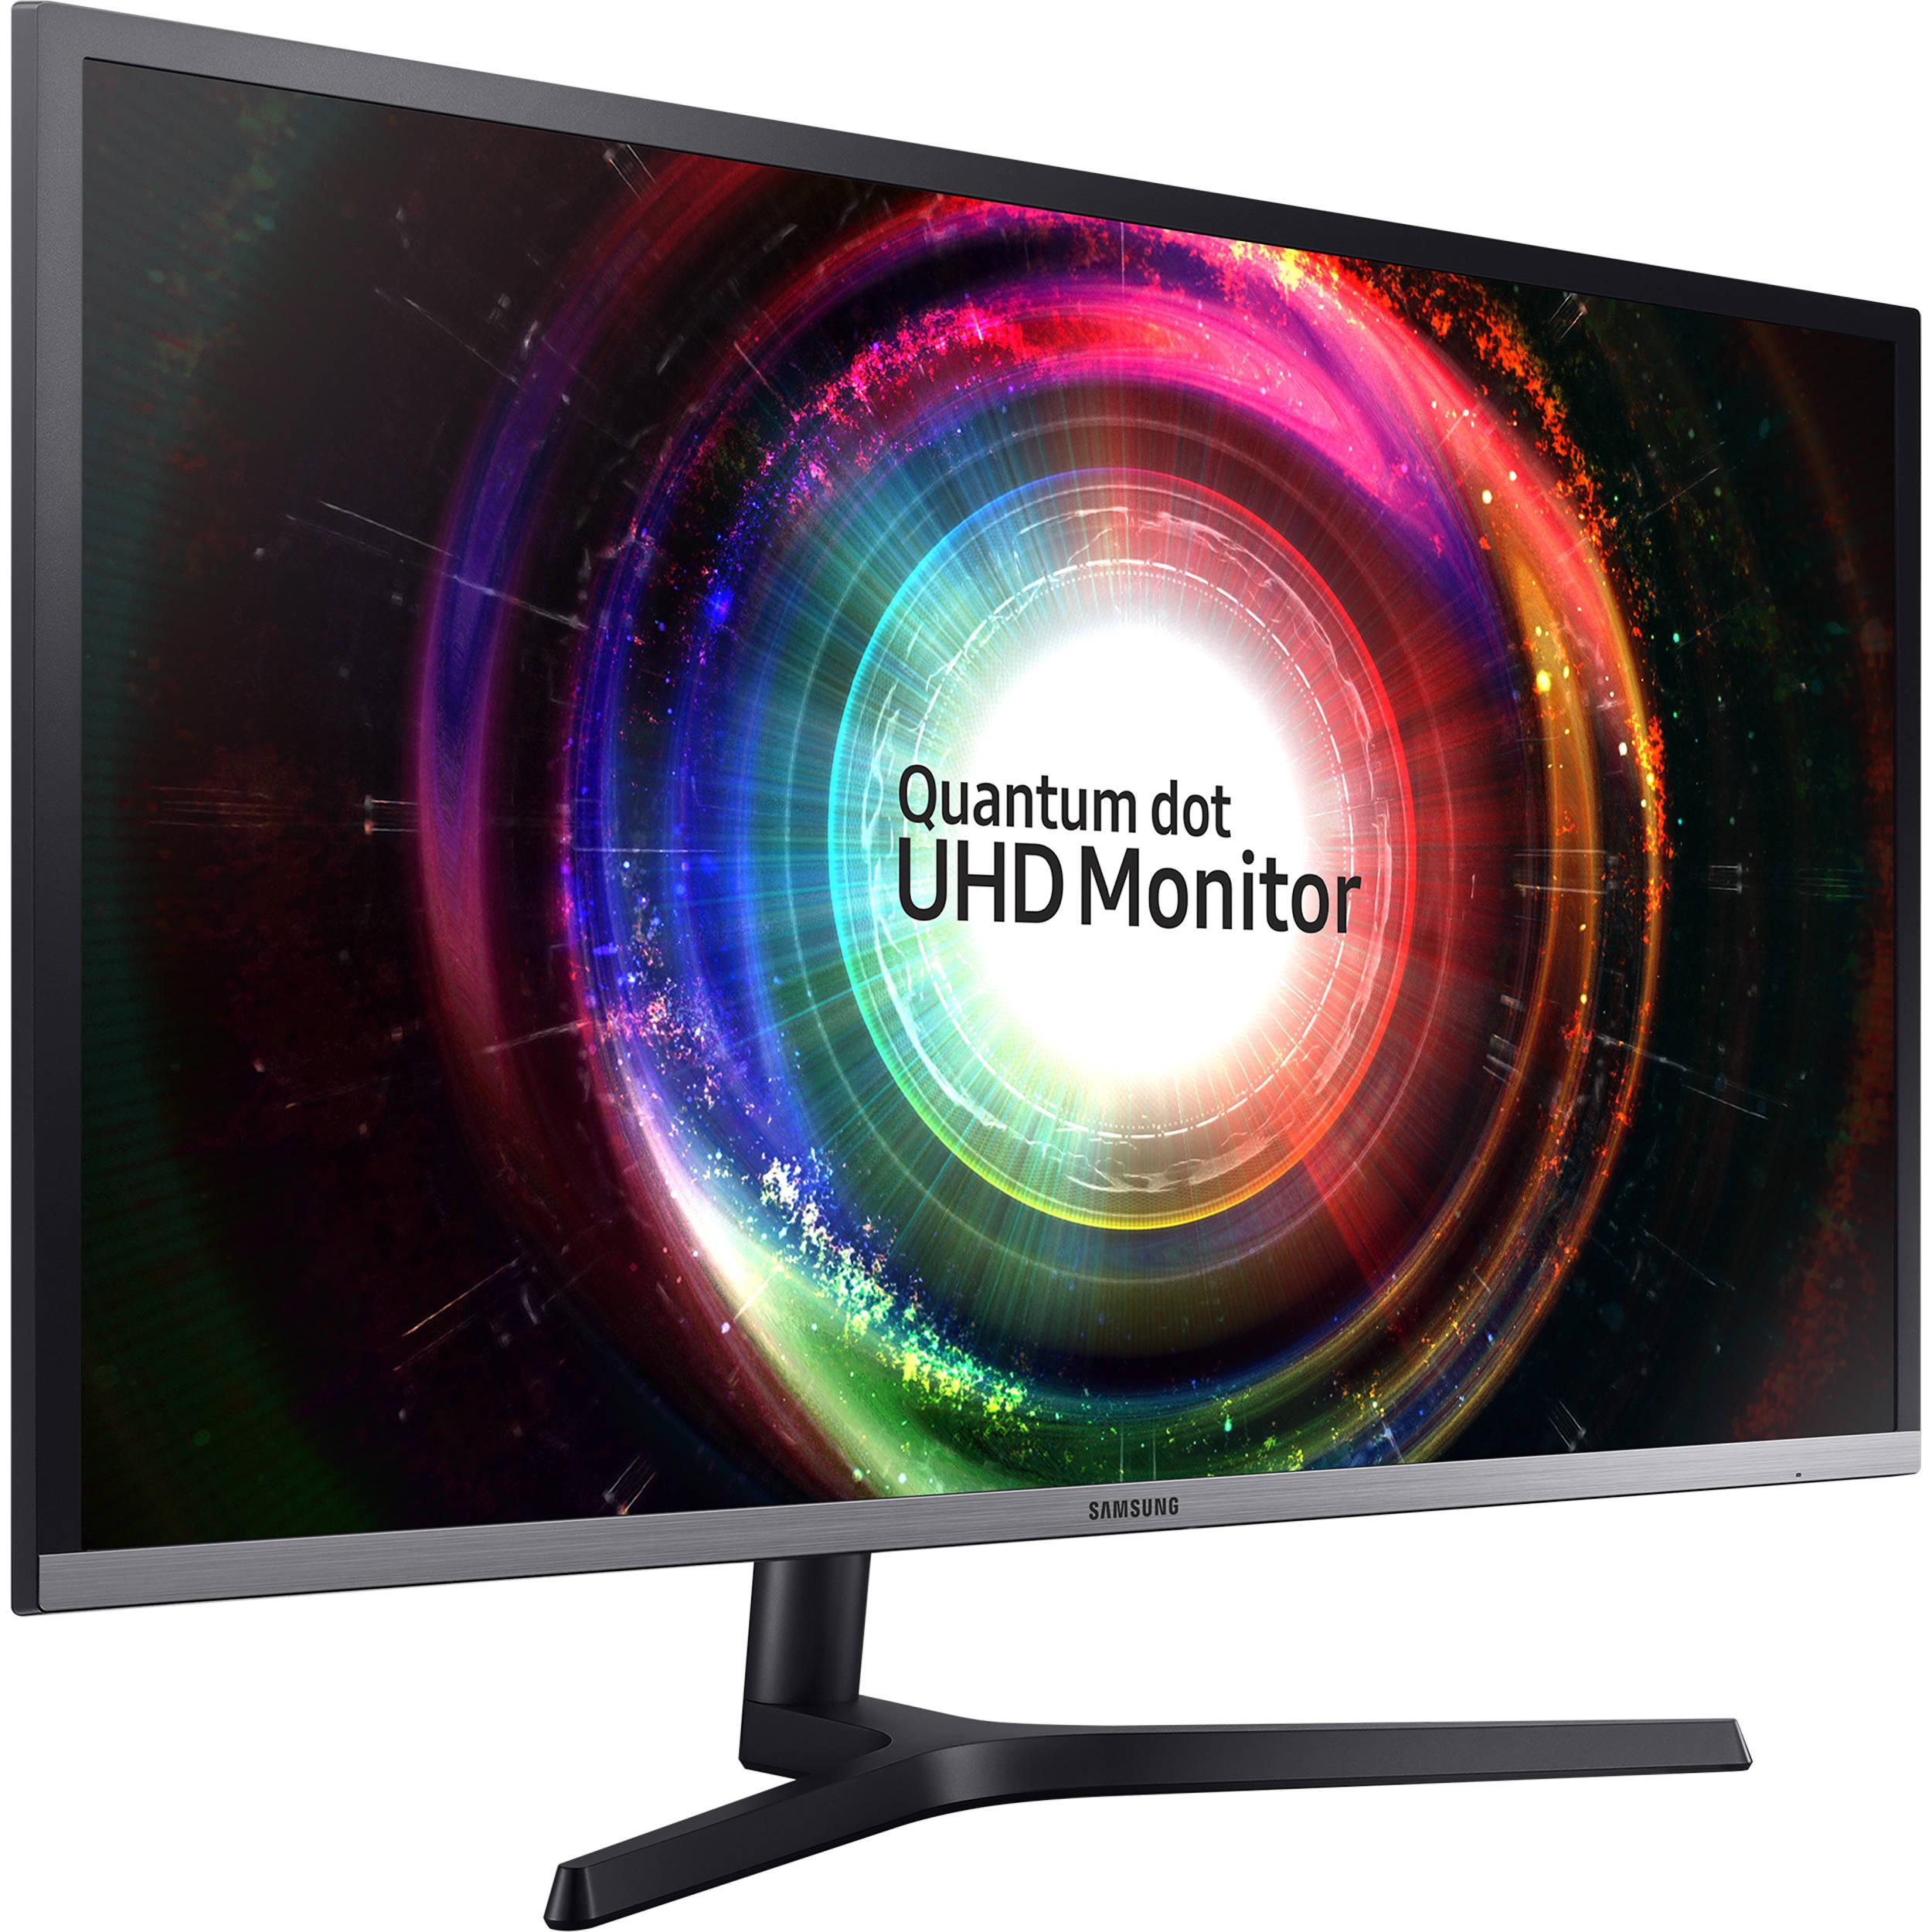 "Samsung UH9 Series 9.9"" 9:9 9K FreeSync LCD Monitor"